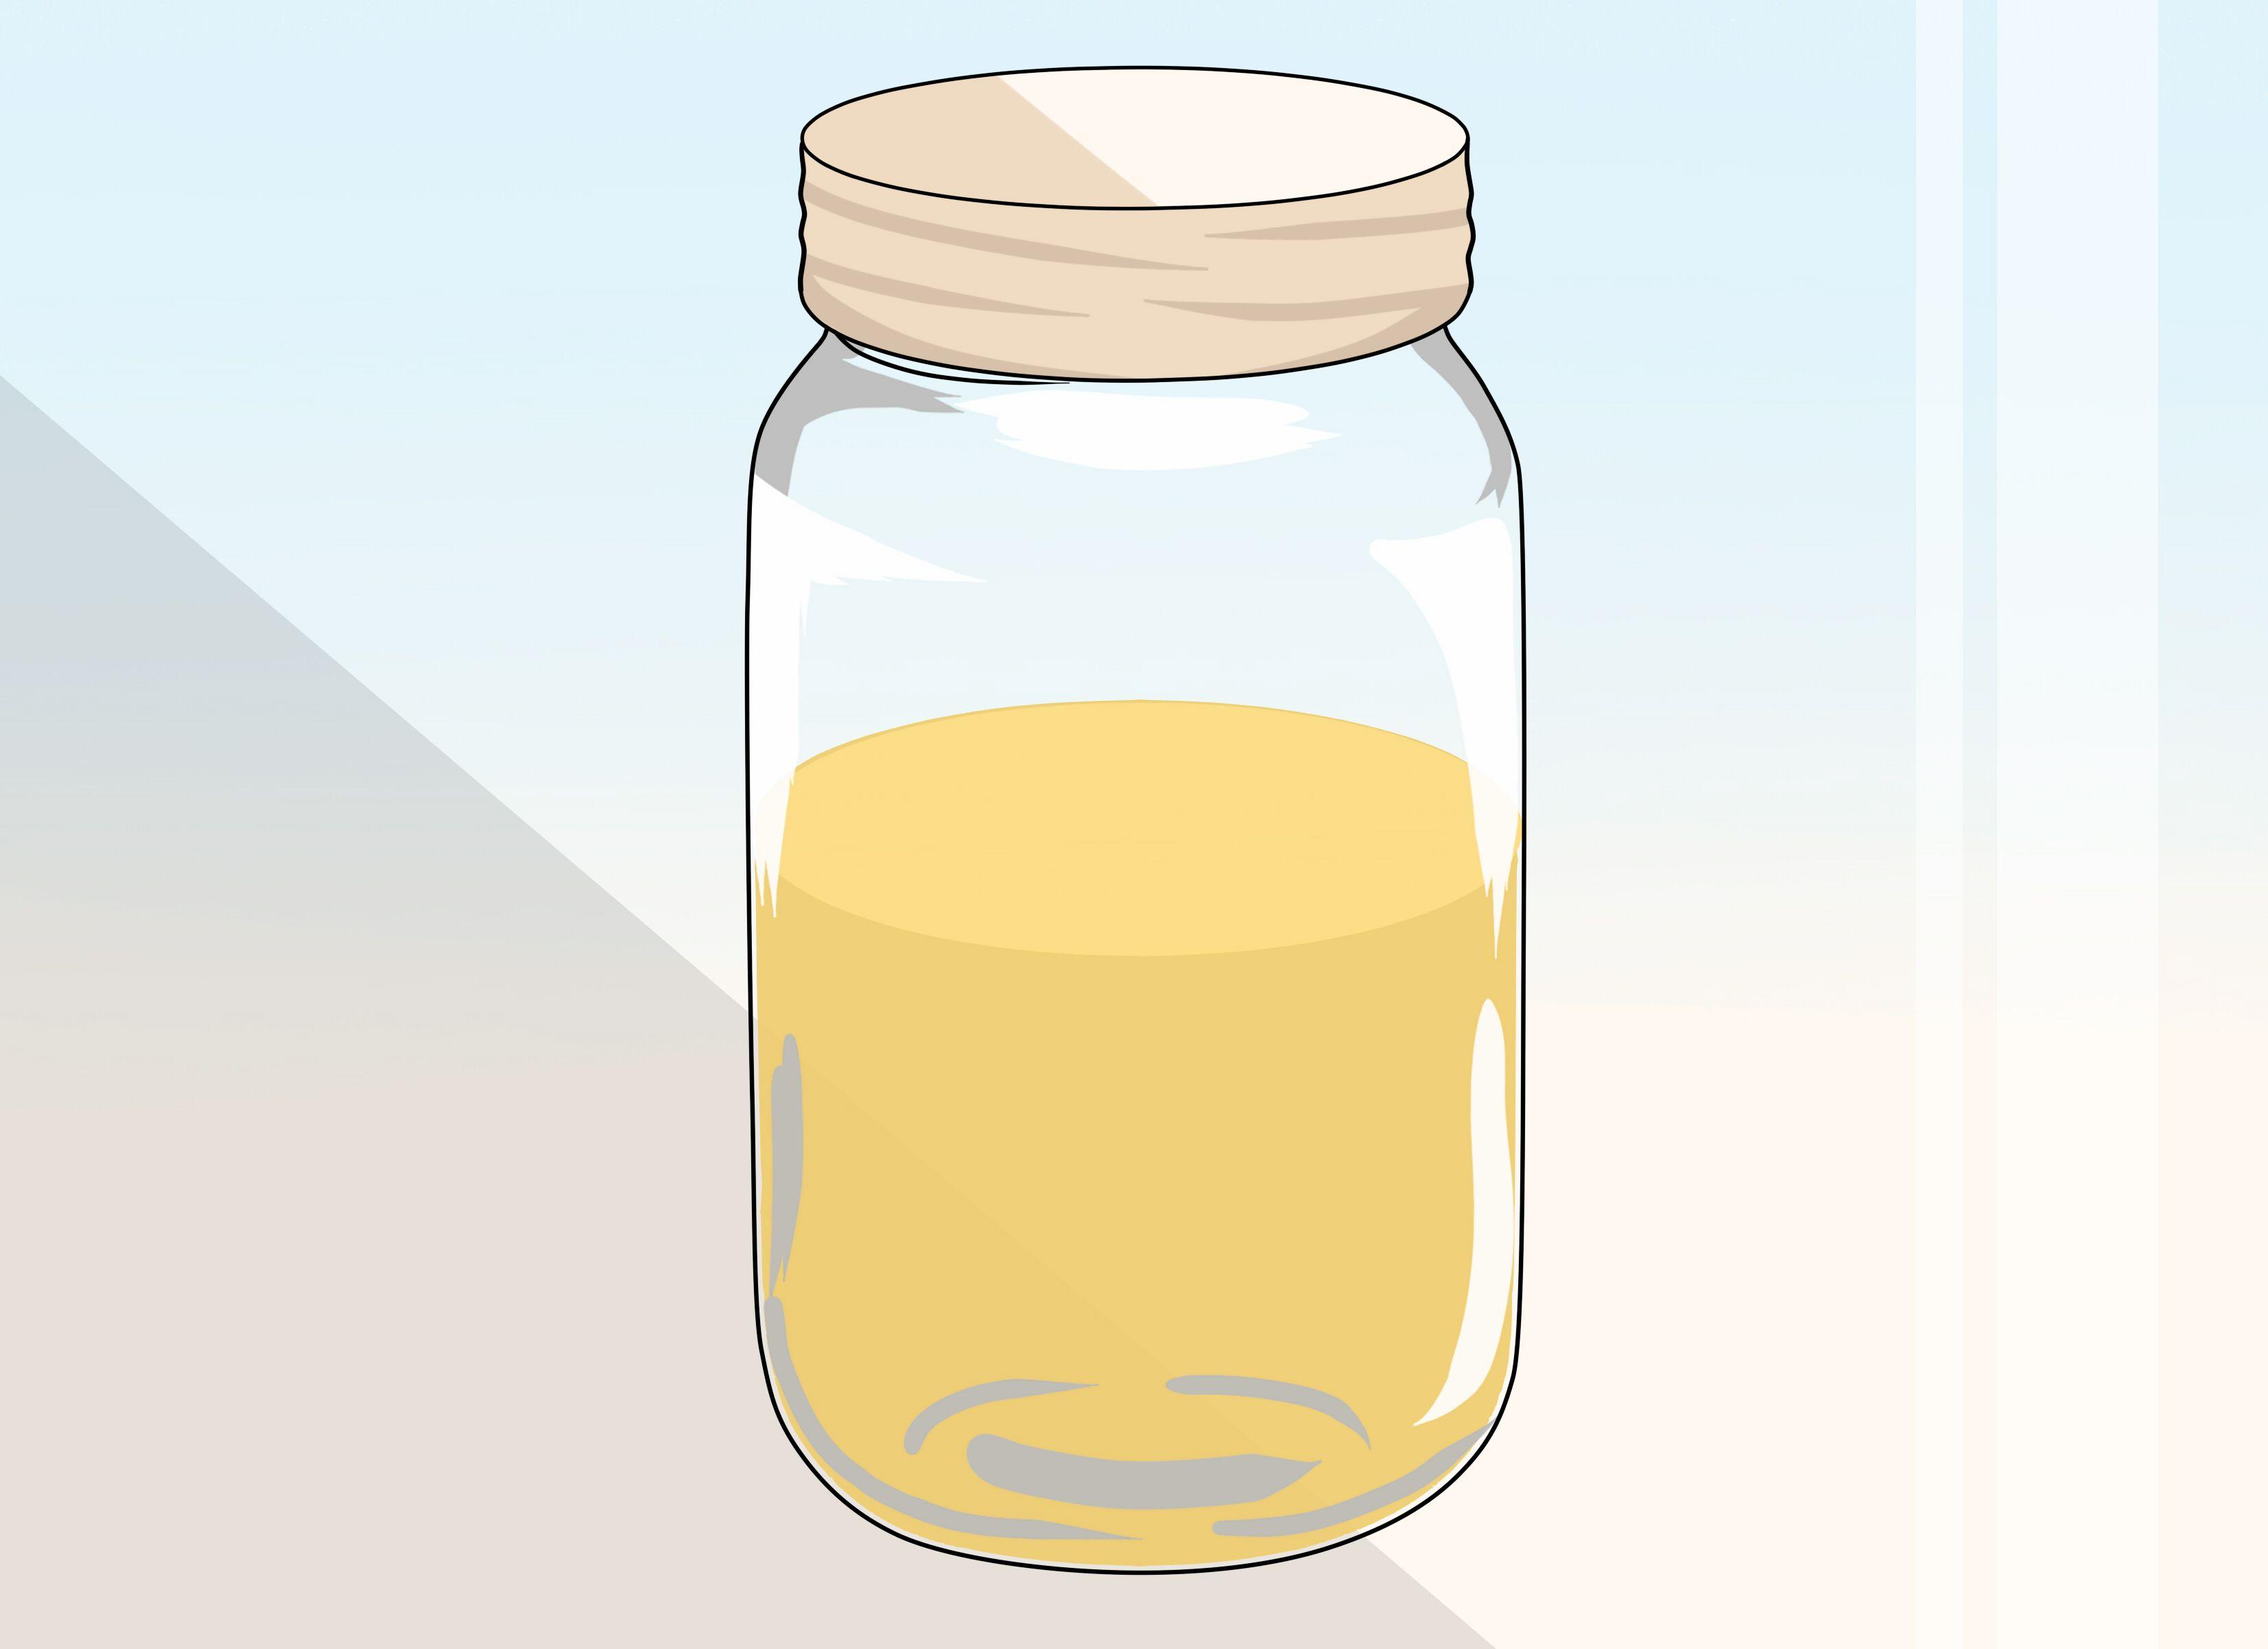 Make Moonshine Mash How to make moonshine, Alcoholic